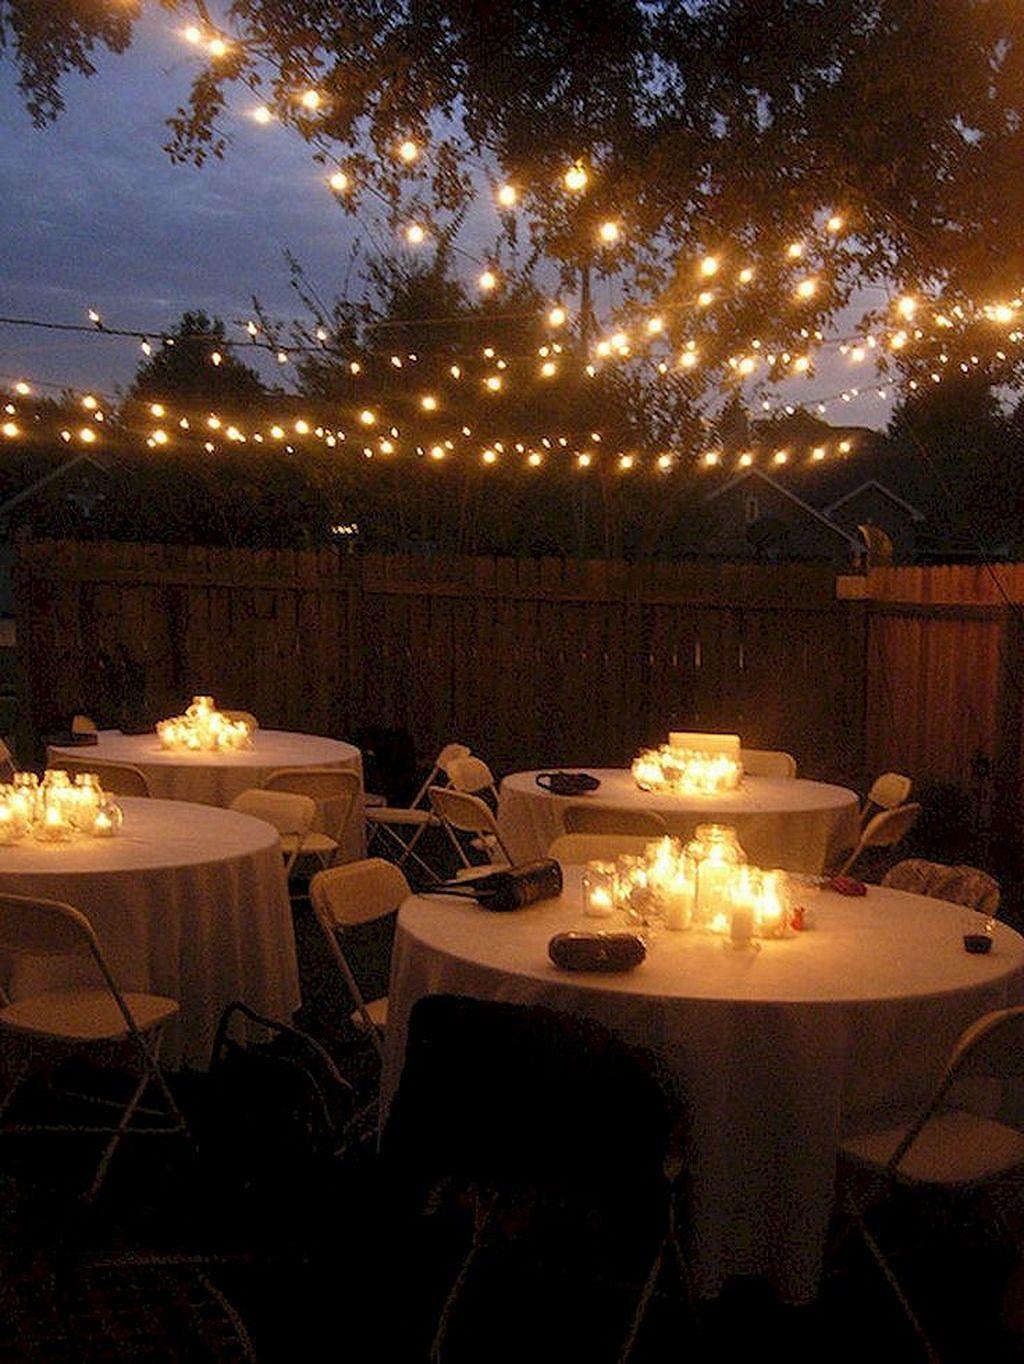 50+ Romantic Backyard Outdoor Weddings Ideas | Romantic ... on Romantic Backyard Ideas id=55966